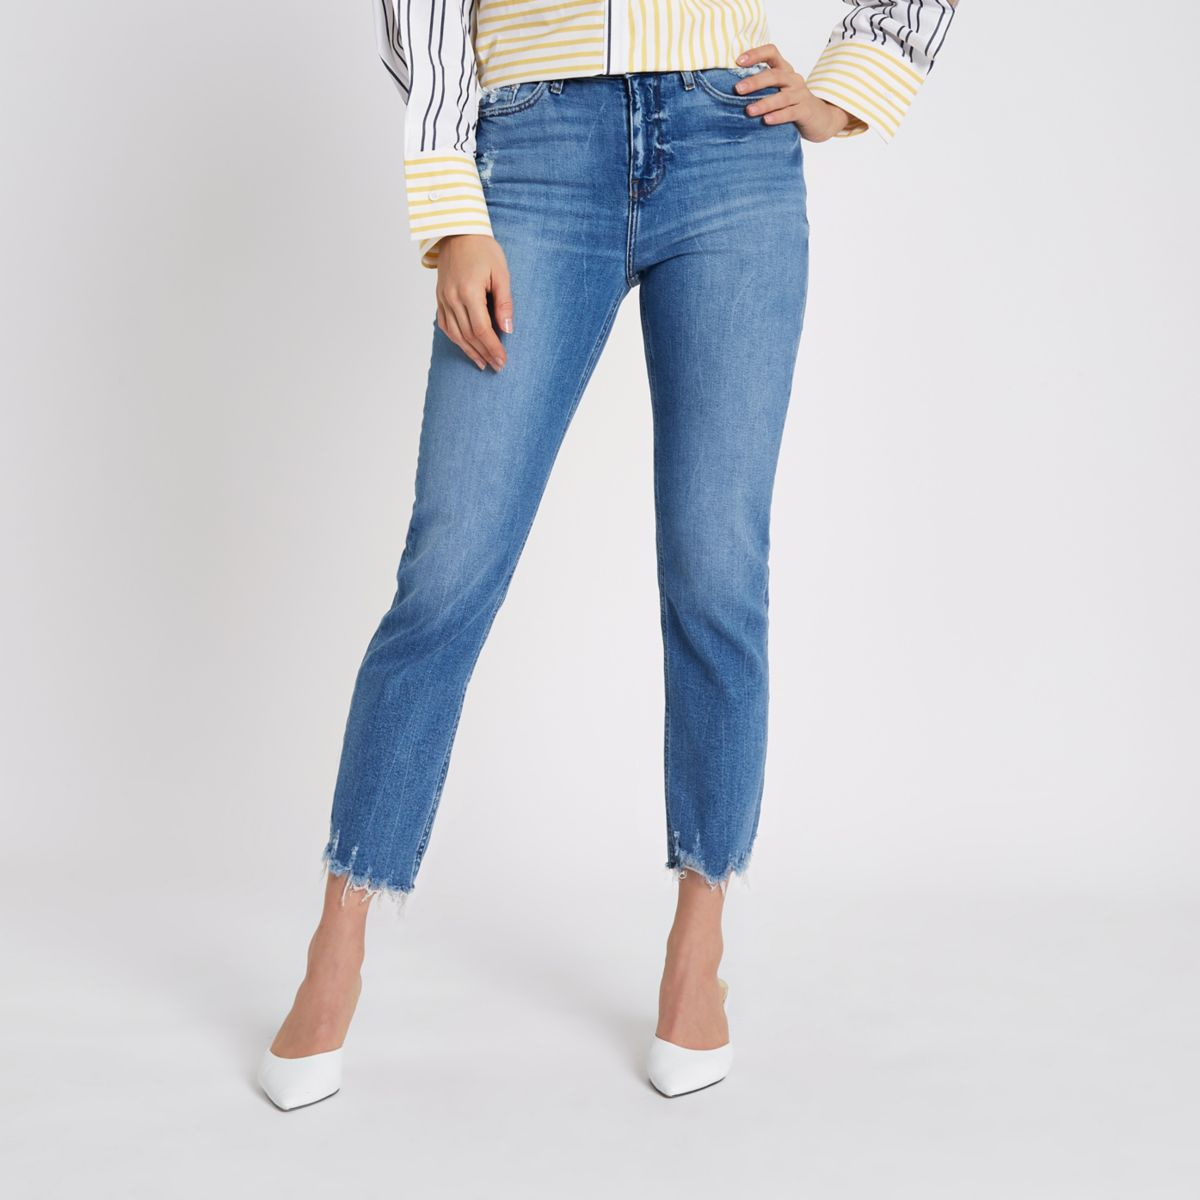 Blue Bella distressed straight leg jeans